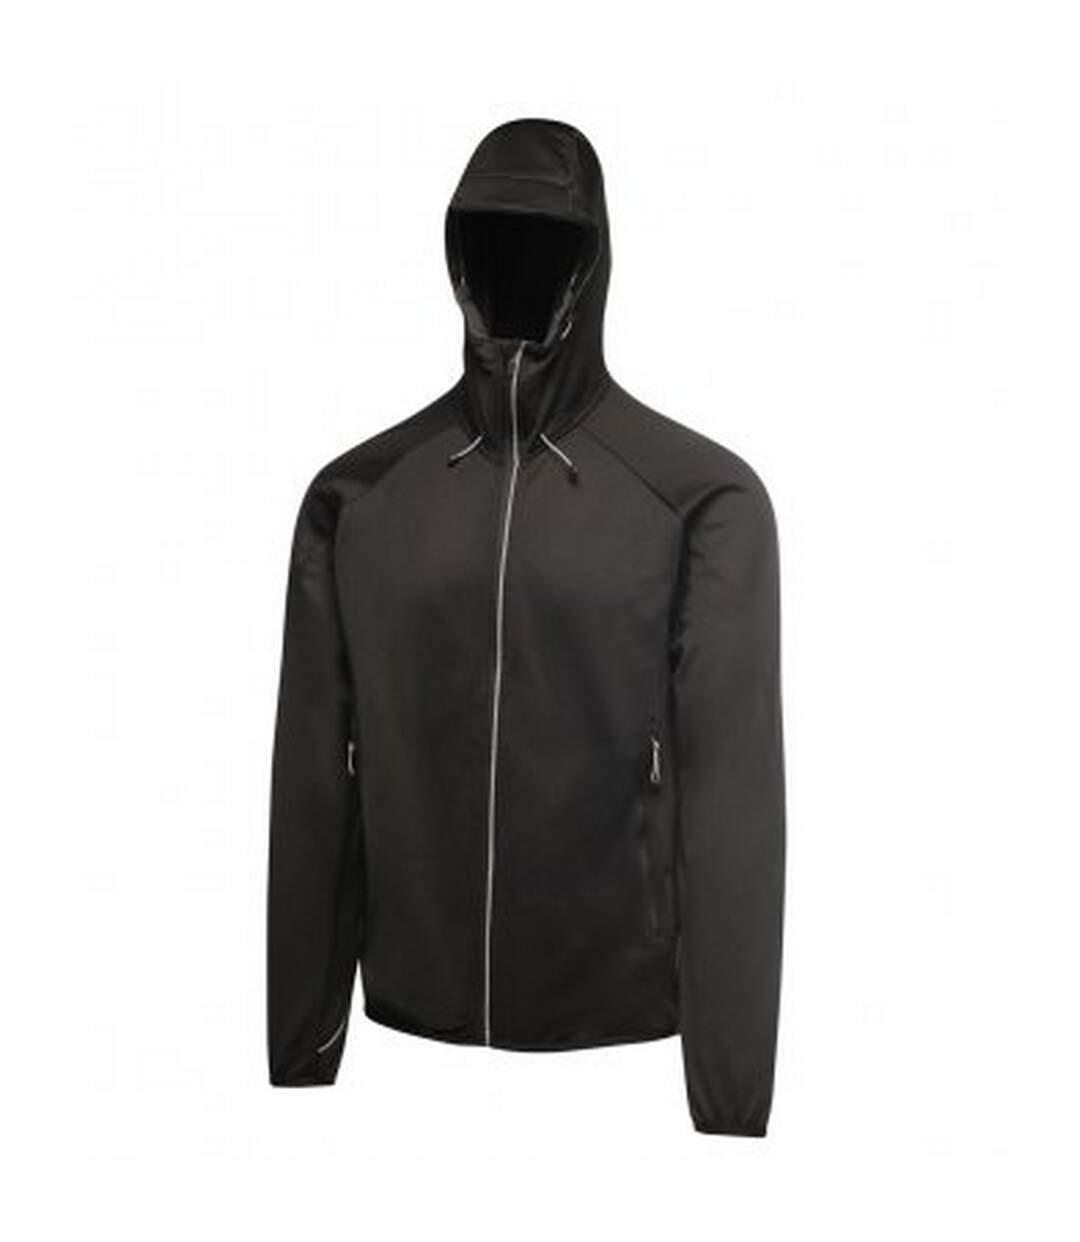 Regatta Activewear Mens Helsinki Powerstretch Jacket (Black) - UTPC3125